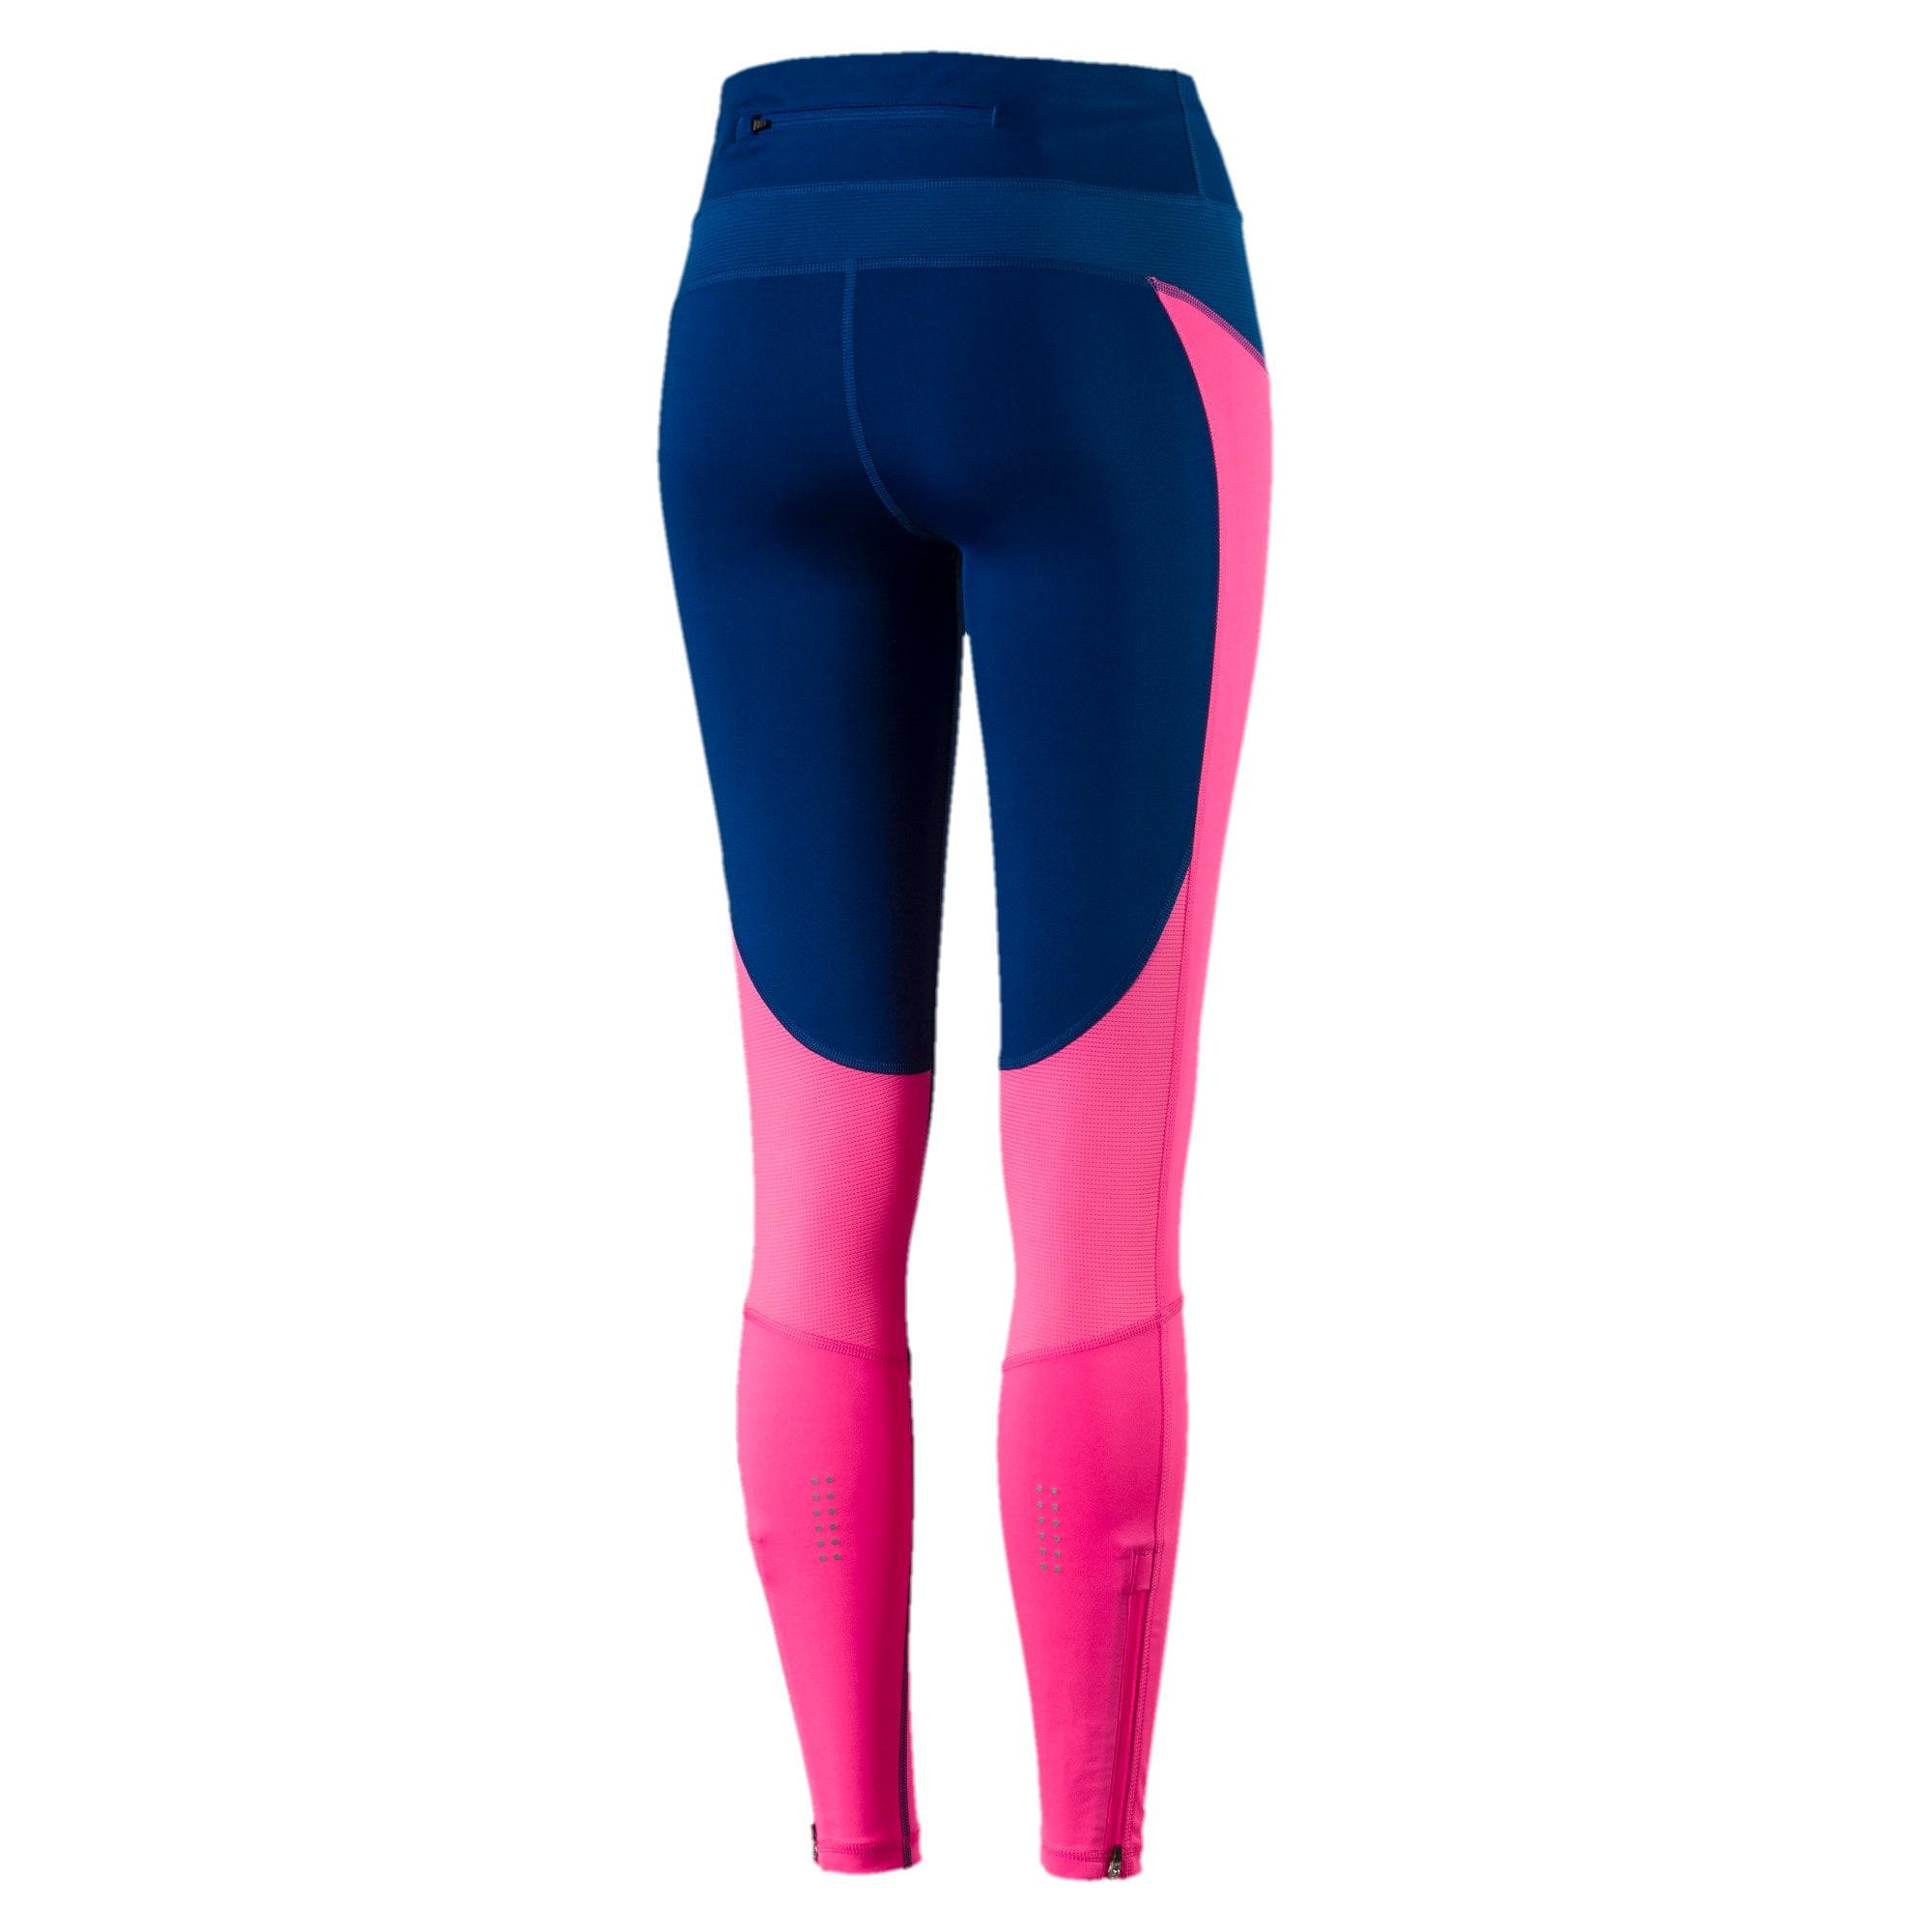 Thumbnail 5 of Running Women's Speed Tights, KNOCKOUT PINK-TRUE BLUE, medium-IND